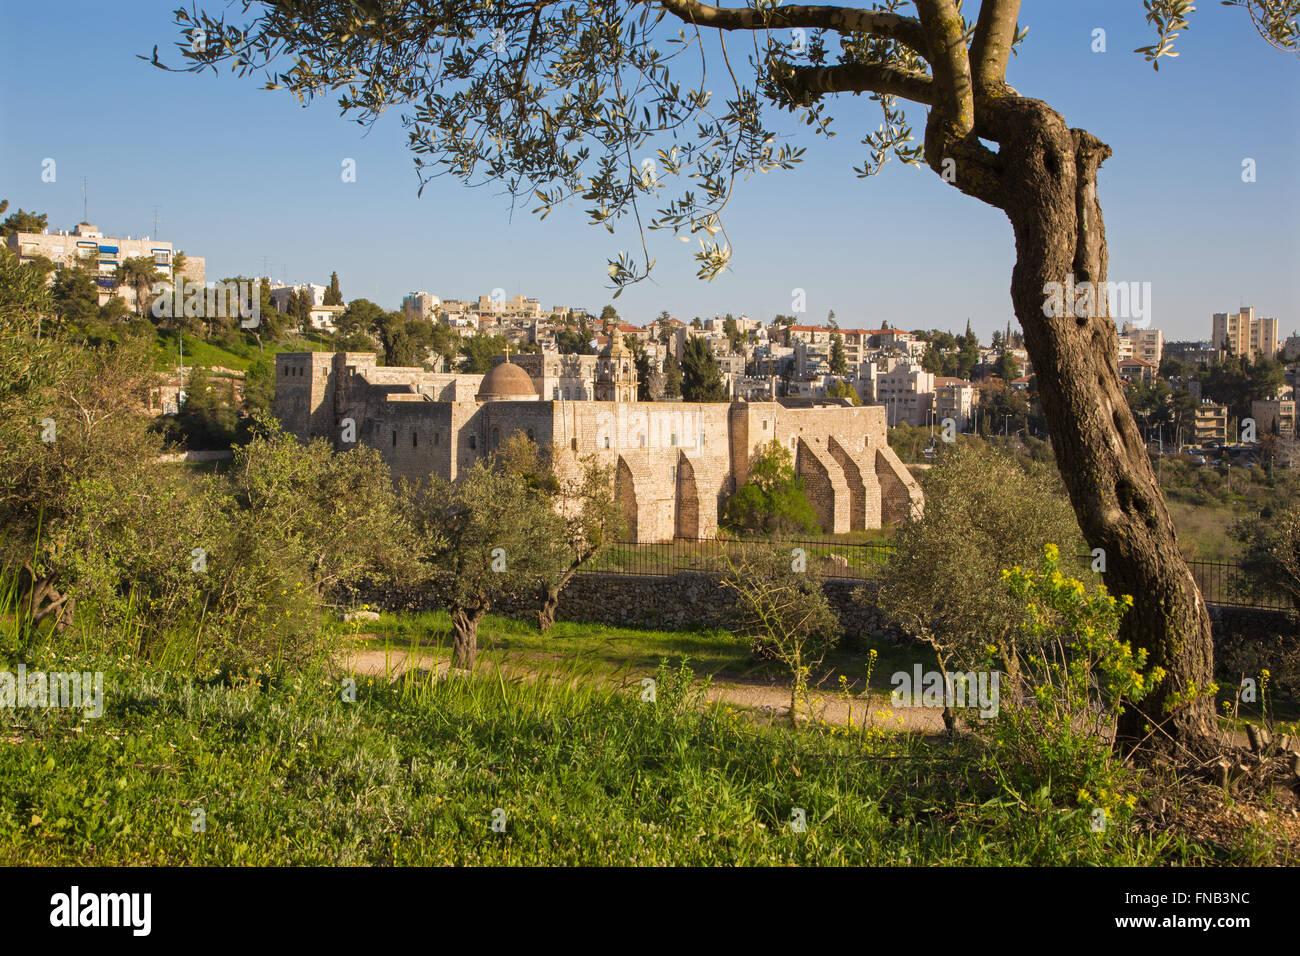 Israel - Jerusalem - Kloster vom Kreuz aus dem 11. Jahrhundert. Stockbild